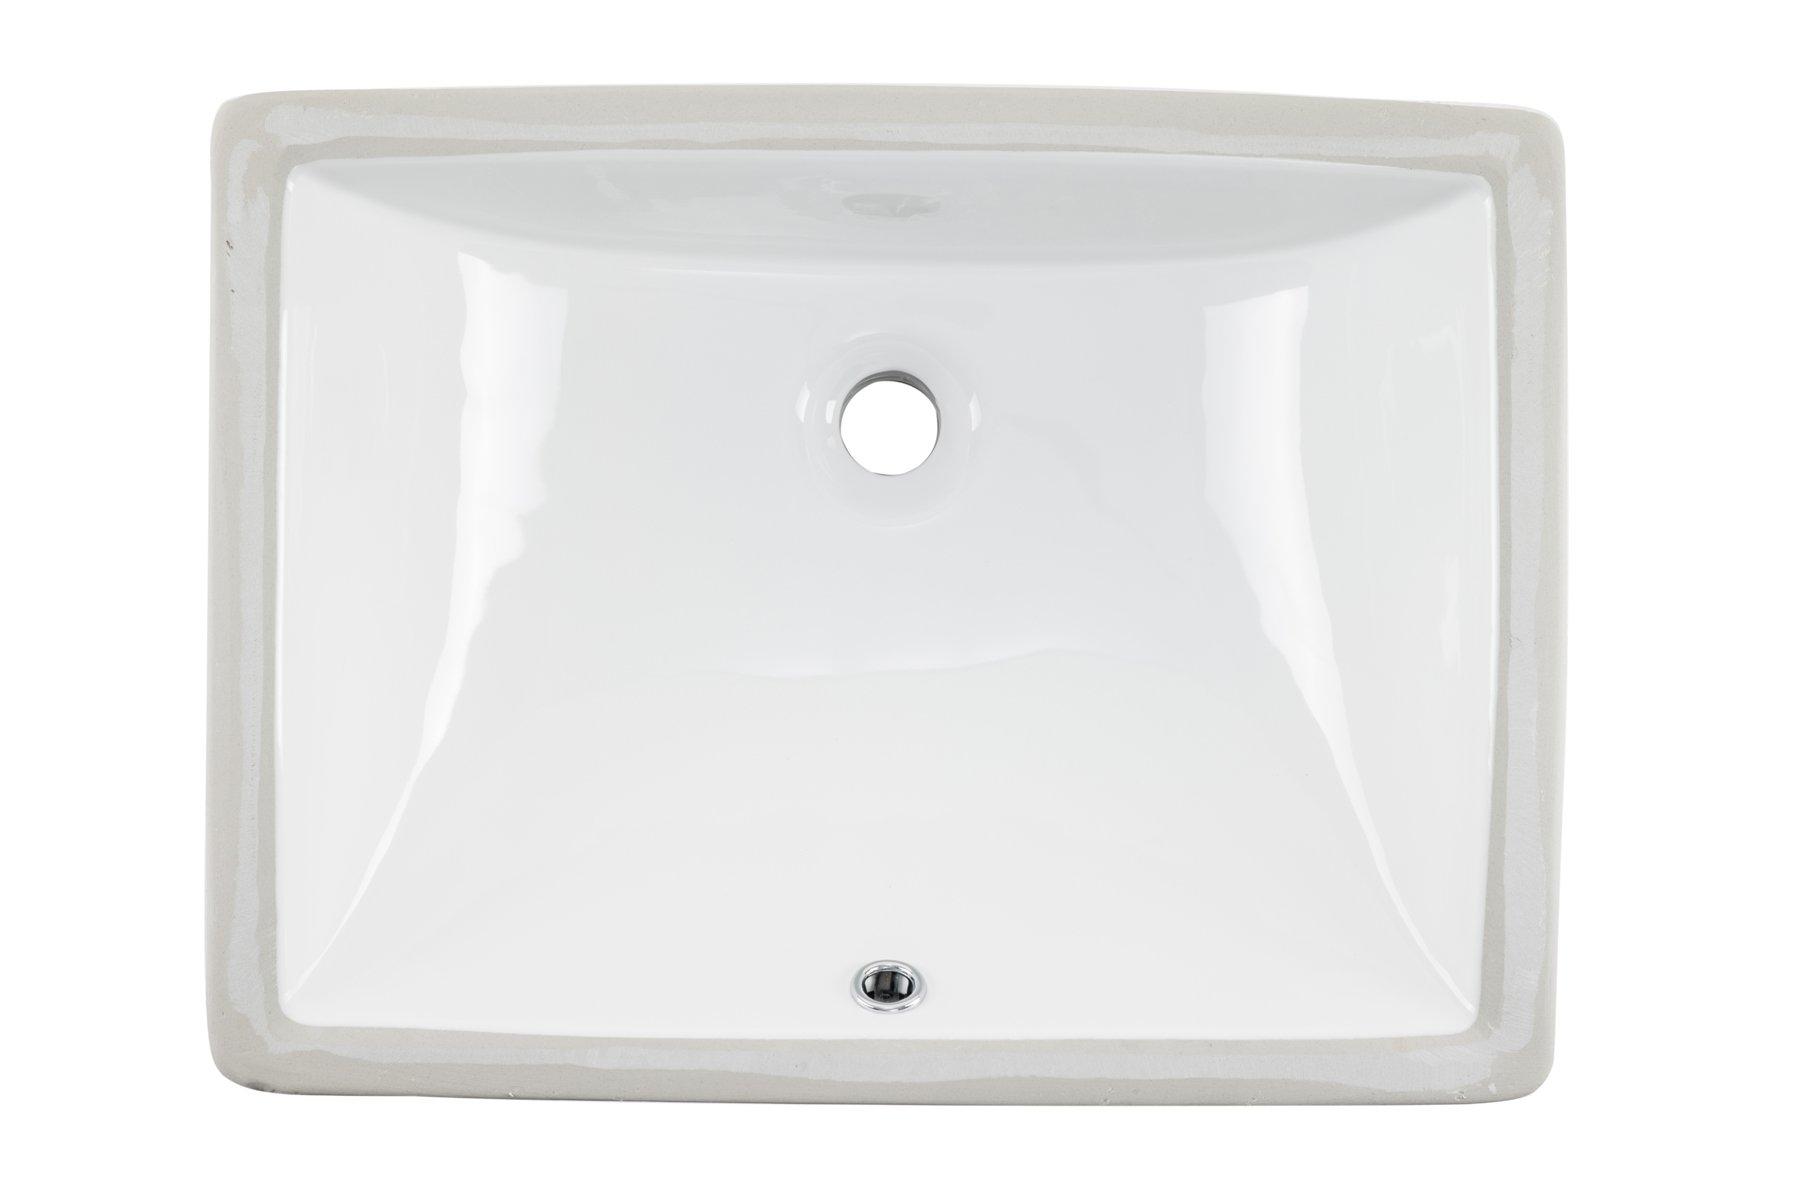 1813CBW 18'' x 13'' White Rectangular Porcelain Undermount Lavatory Bathroom Sink